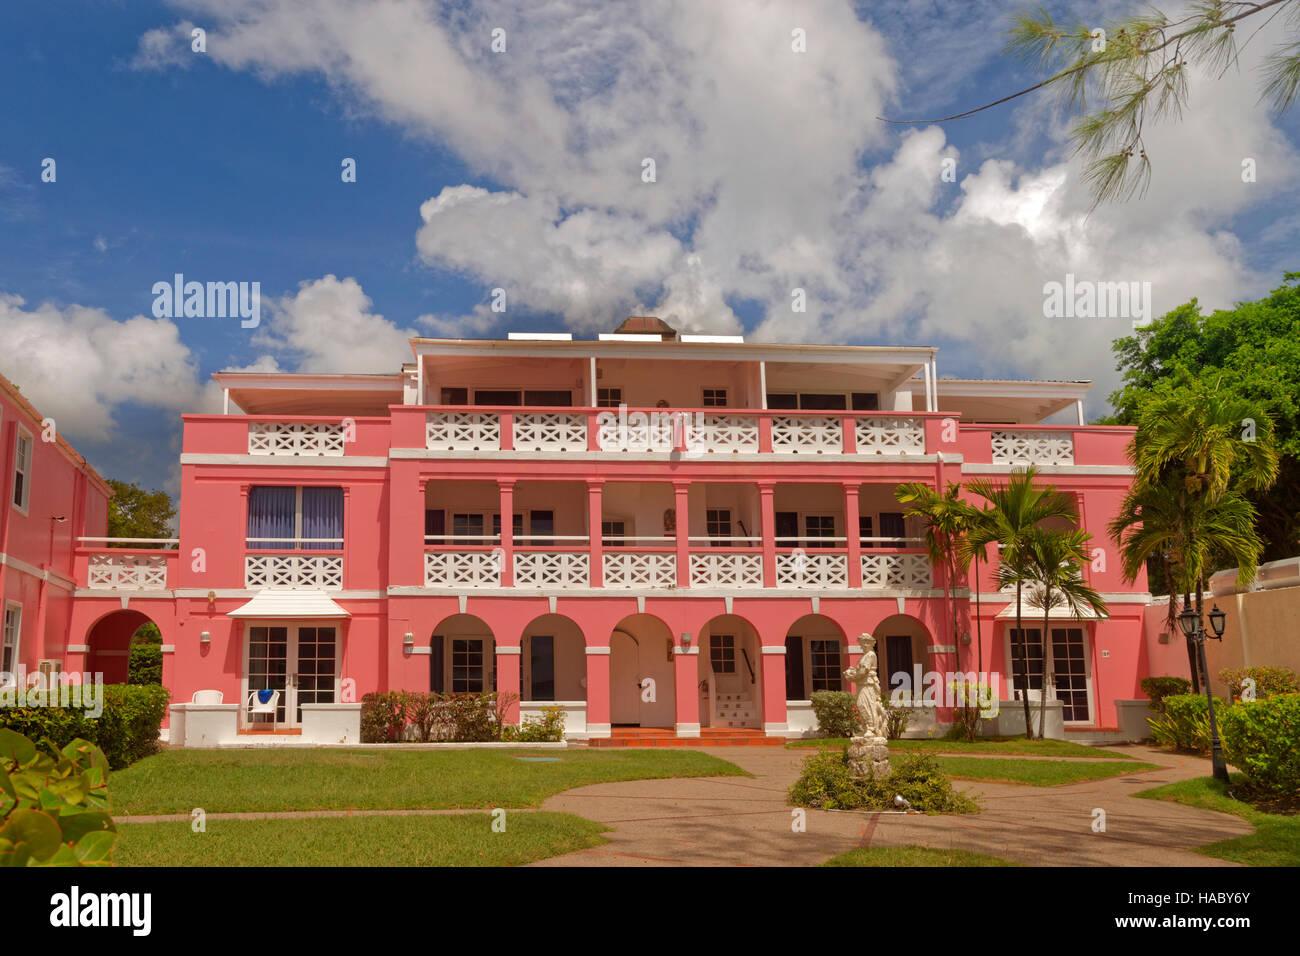 Der Kolonialstil Southern Palms Hotel, Dover, St. Lawrence Gap, in der Nähe von Bridgetown, Barbados, Karibik. Stockbild